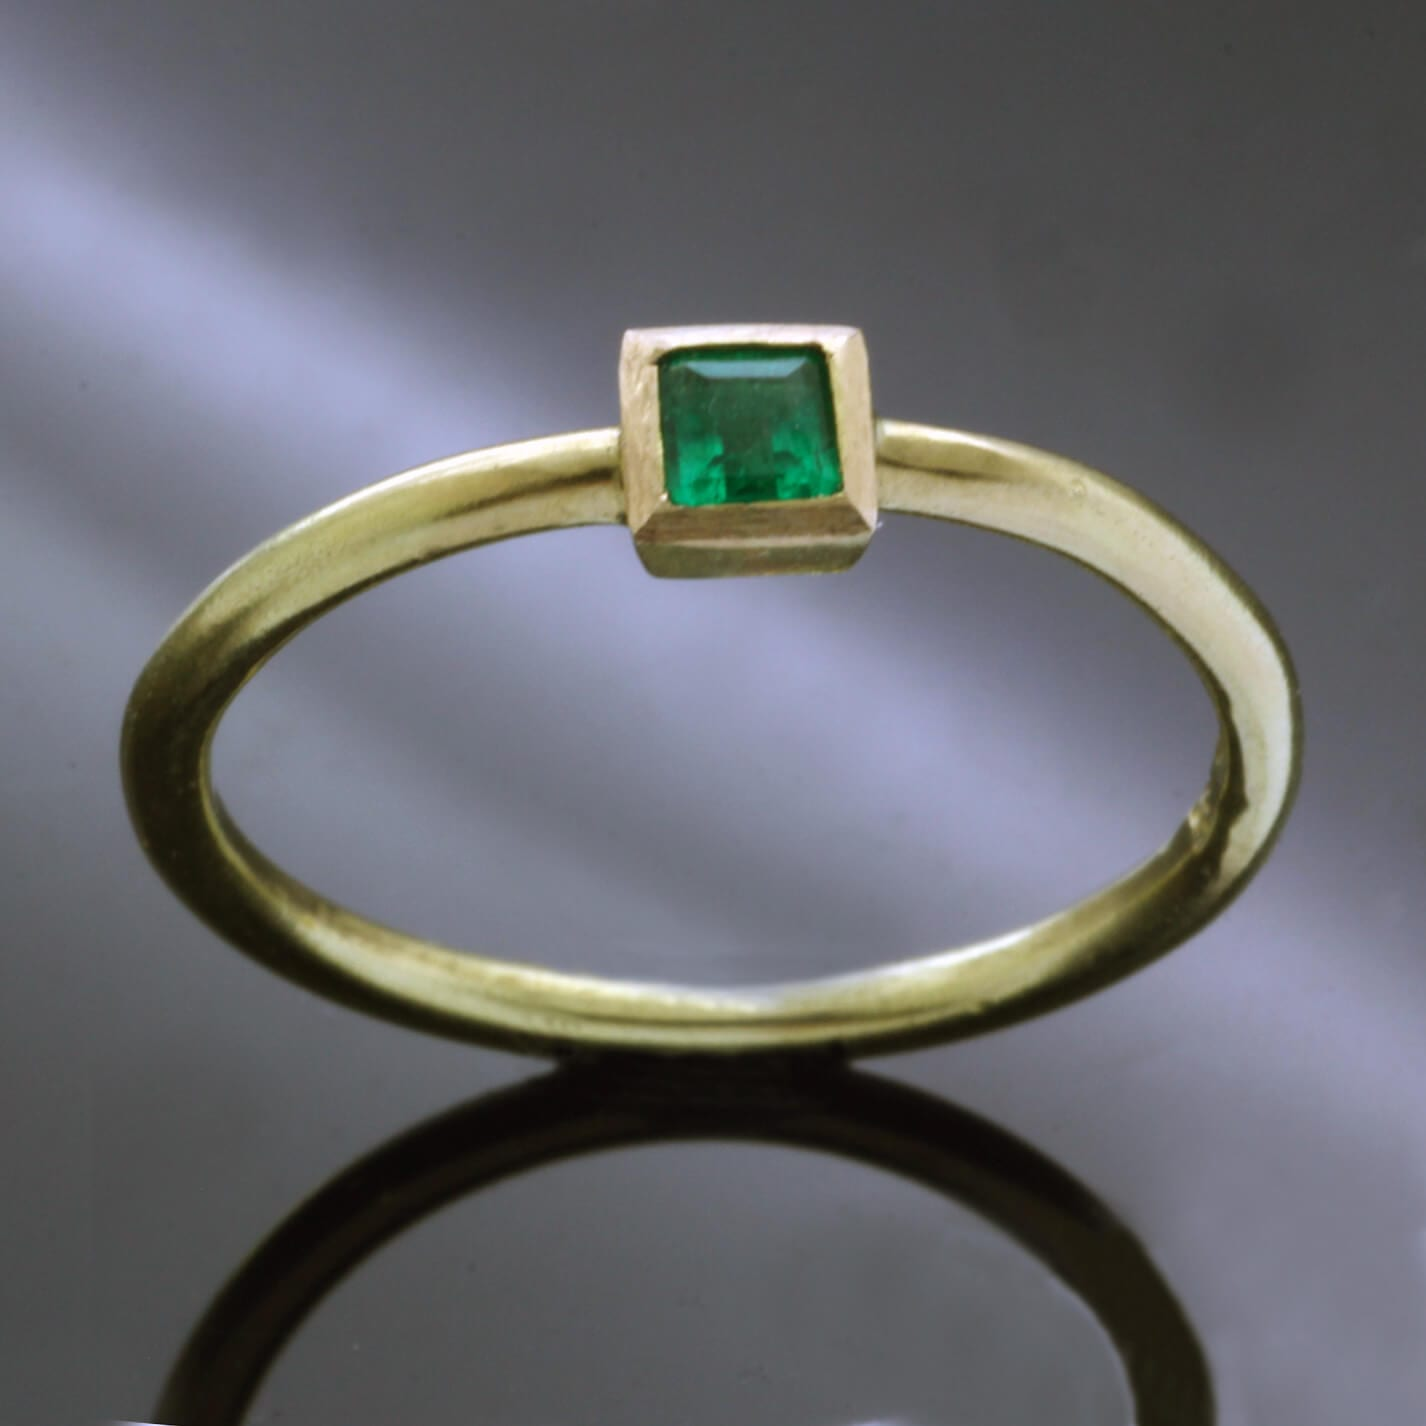 Square cut Emerald precious gemstone handmade Yellow Gold ring